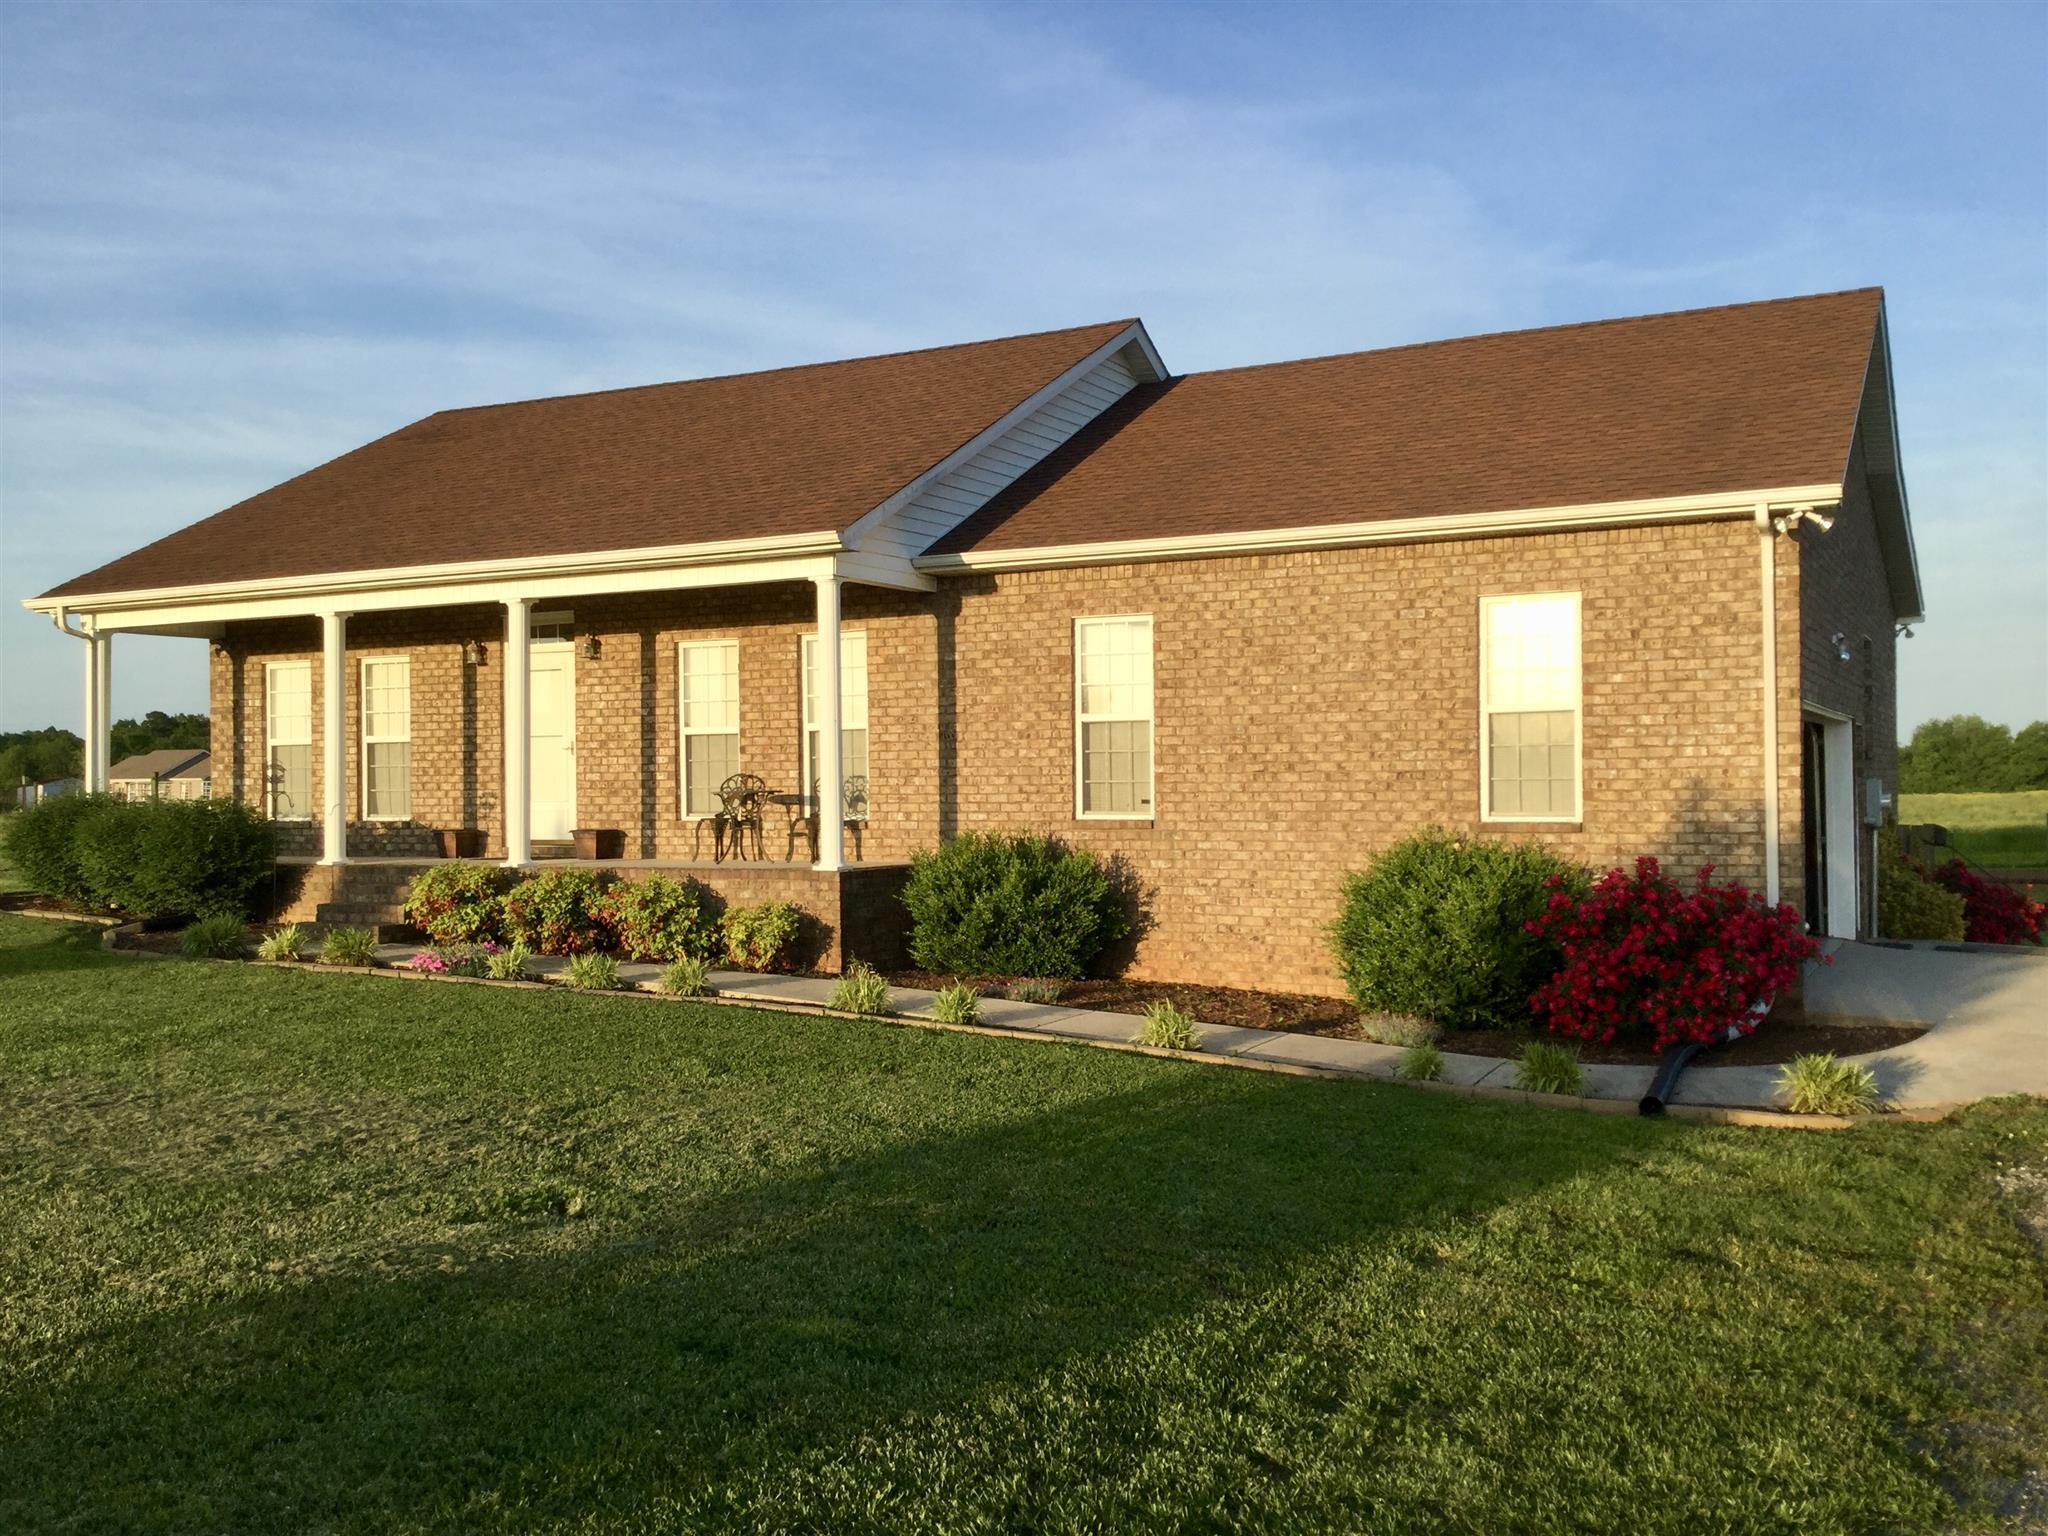 332 Paschal Rd, Unionville, TN 37180 - Unionville, TN real estate listing